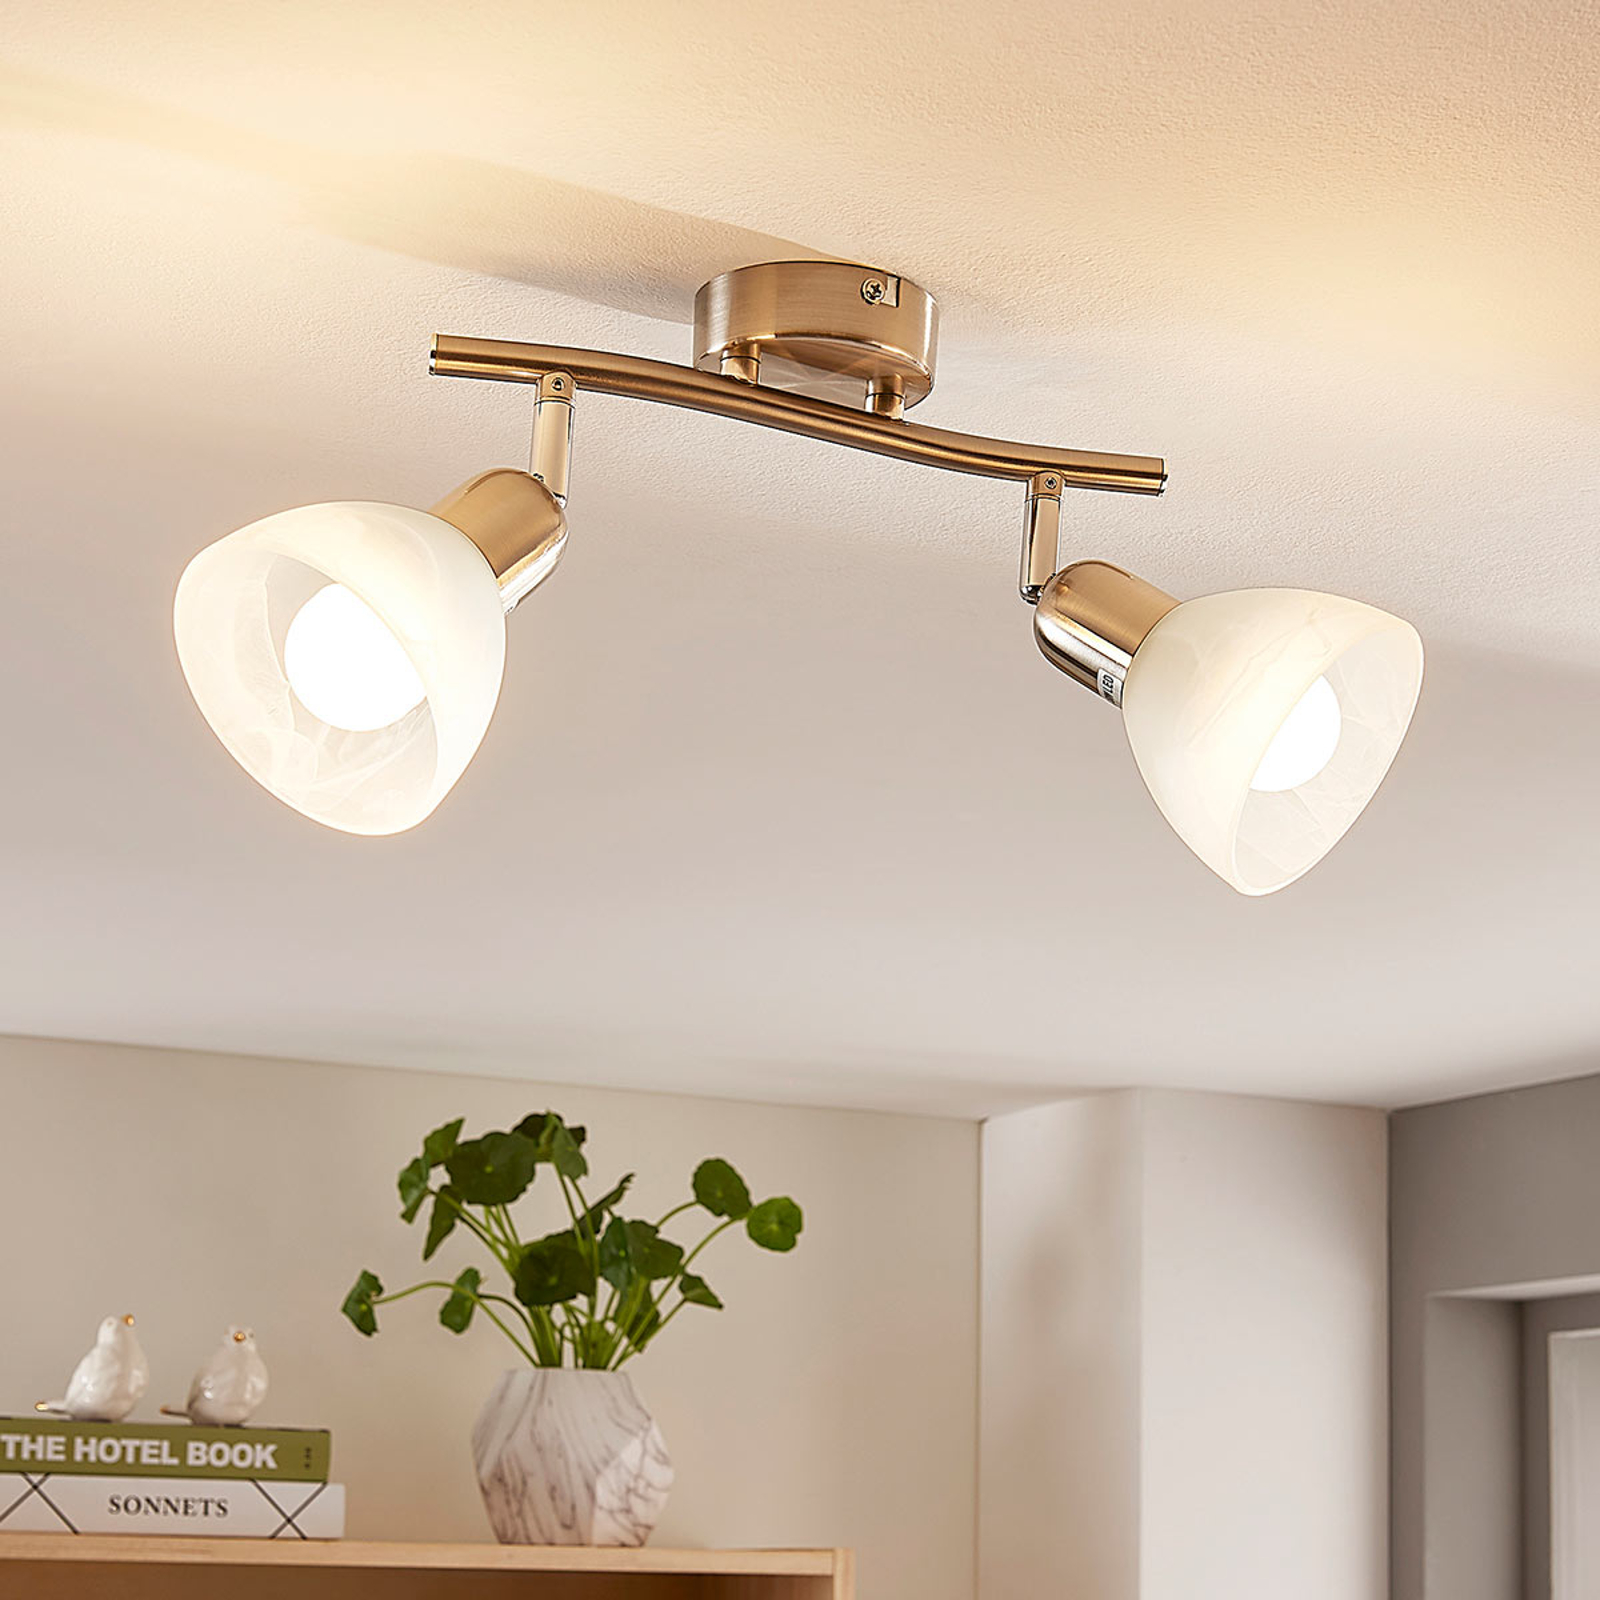 2-lamps LED plafondlamp Paulina, nikkelkleuren